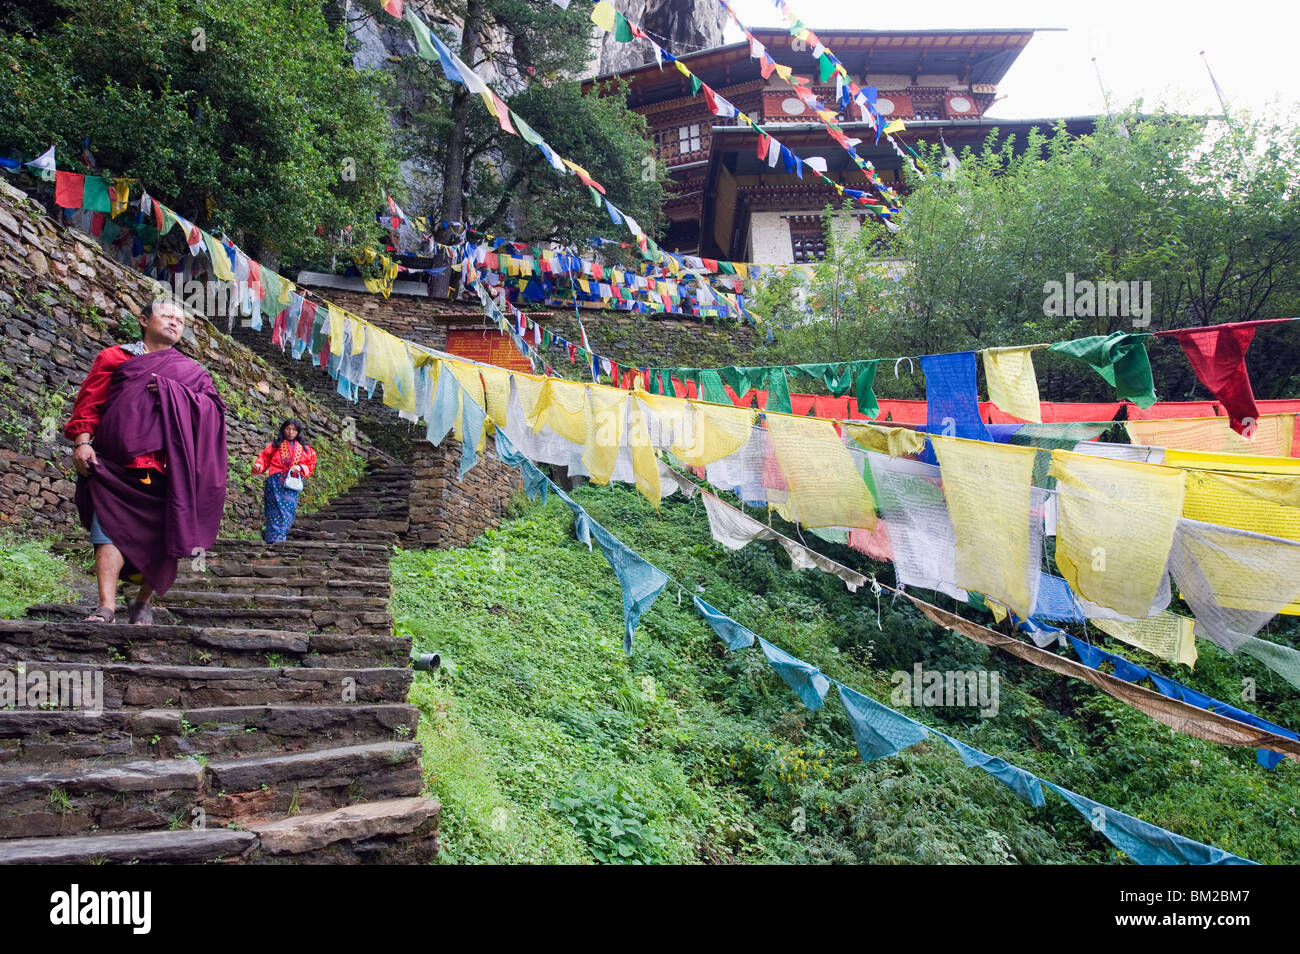 A monk walking through prayer flags, Tigers Nest, Taktsang Goemba, Paro Valley, Bhutan - Stock Image